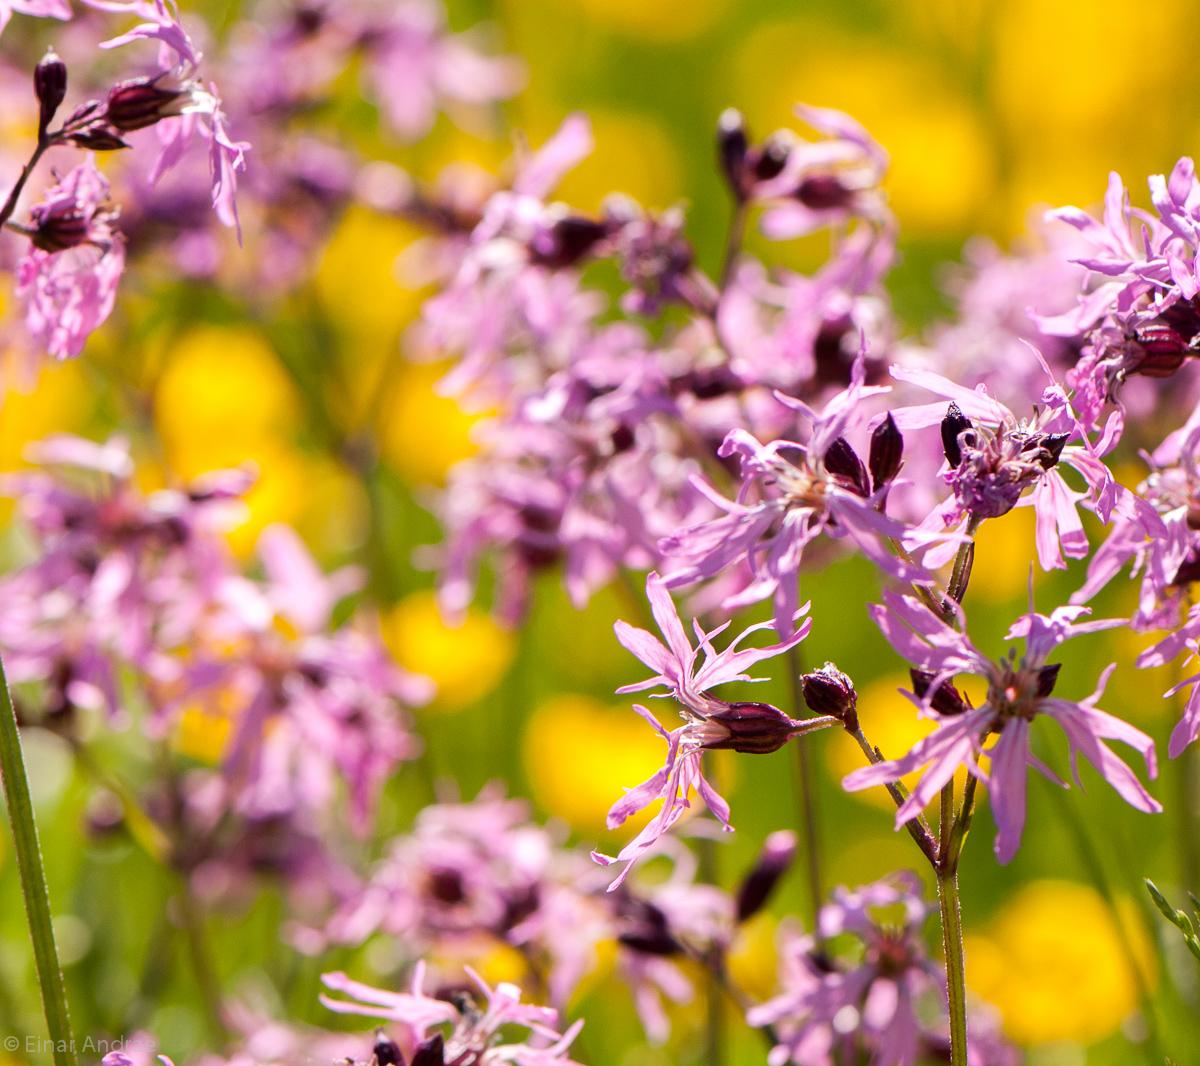 Kuckuckslichtnelken Blüten